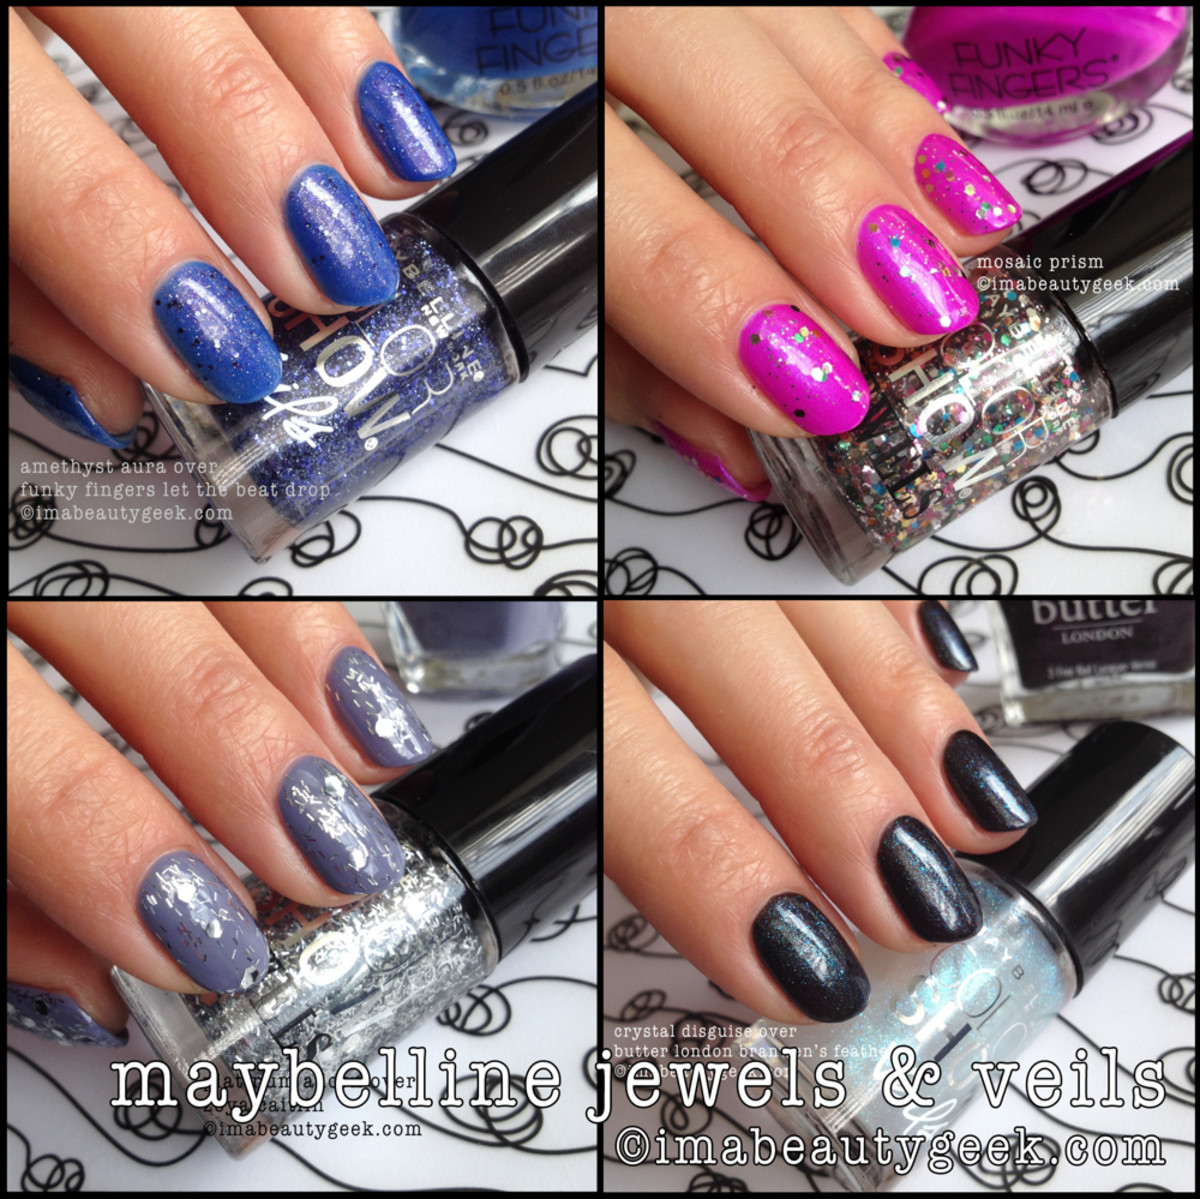 Maybelline Jewels Veils